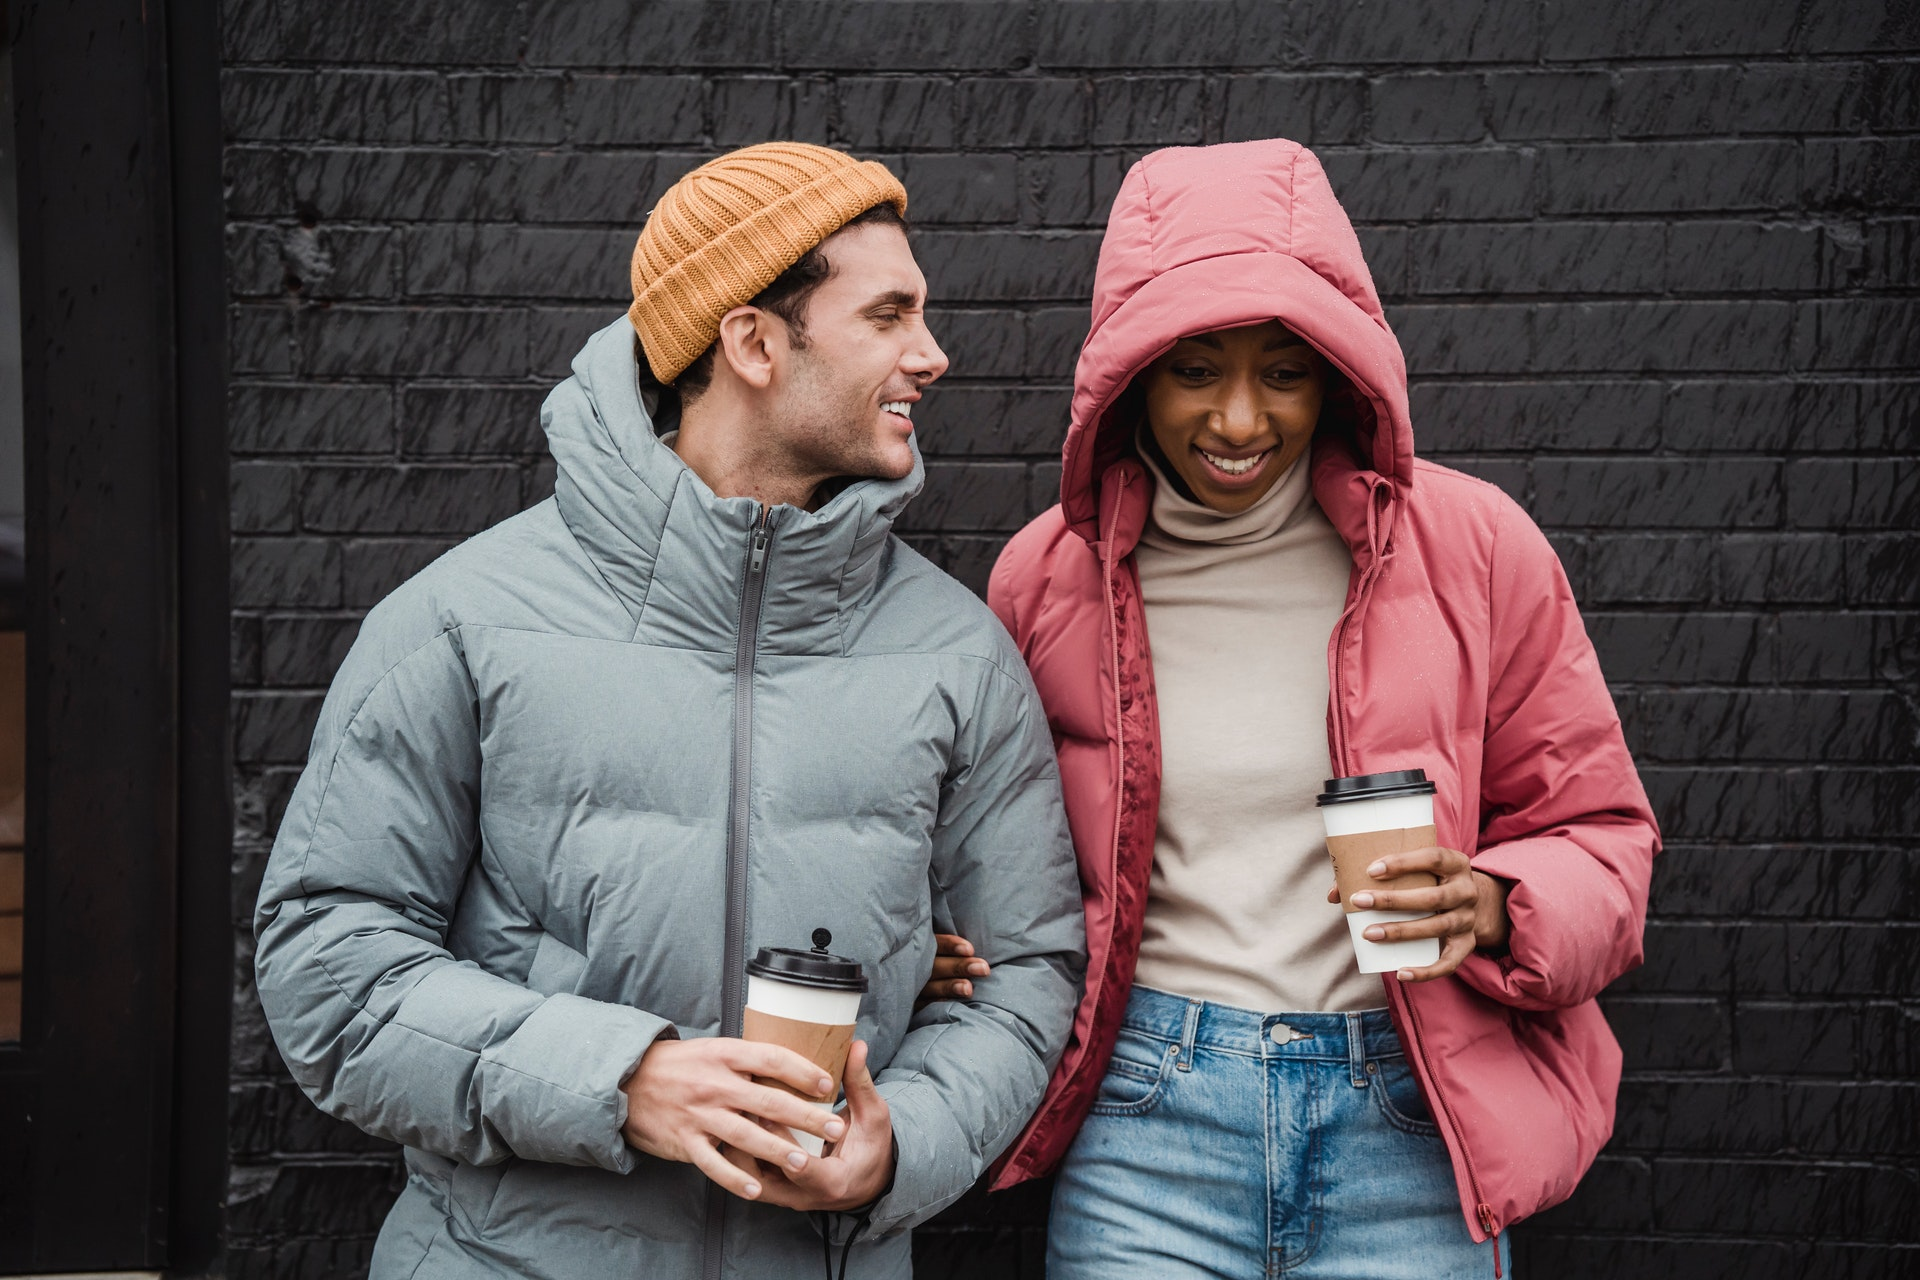 an interracial couple dating